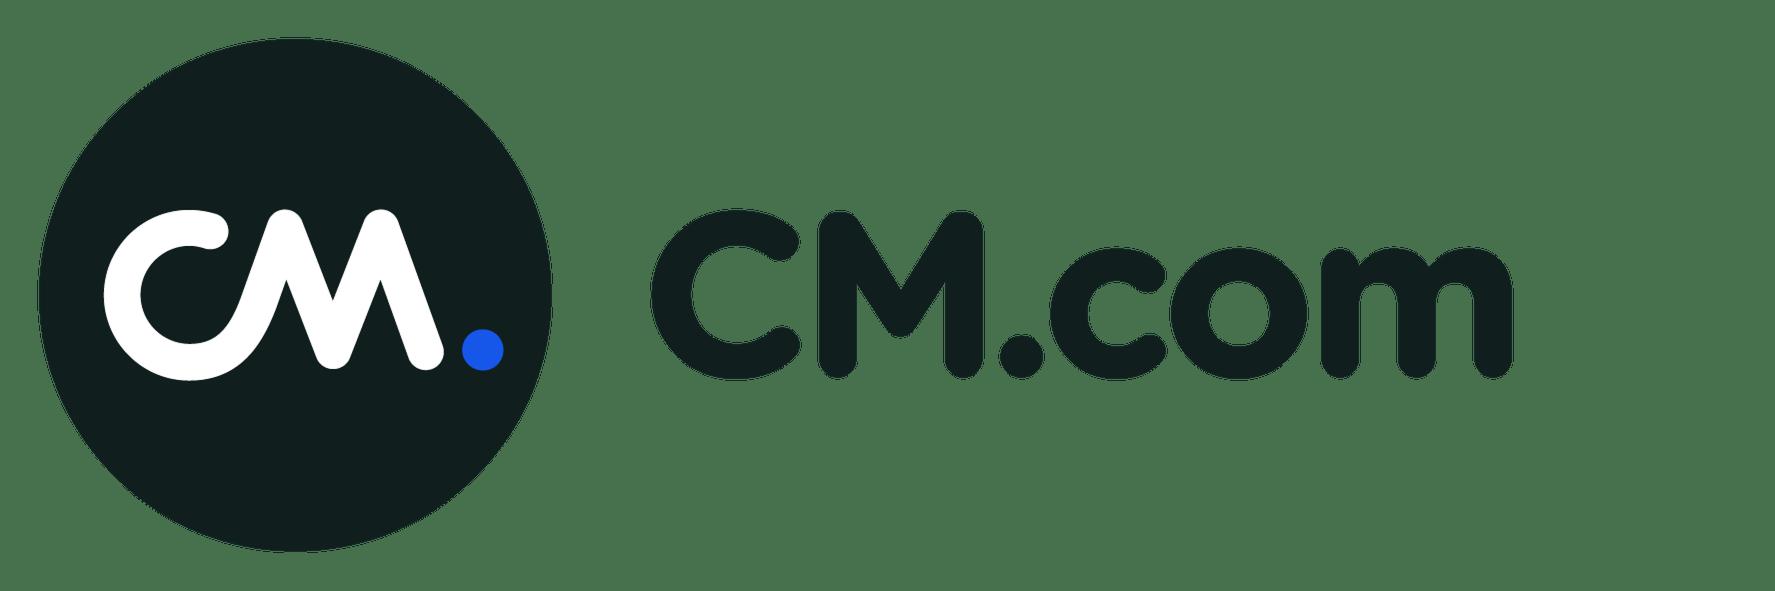 CM.com BV